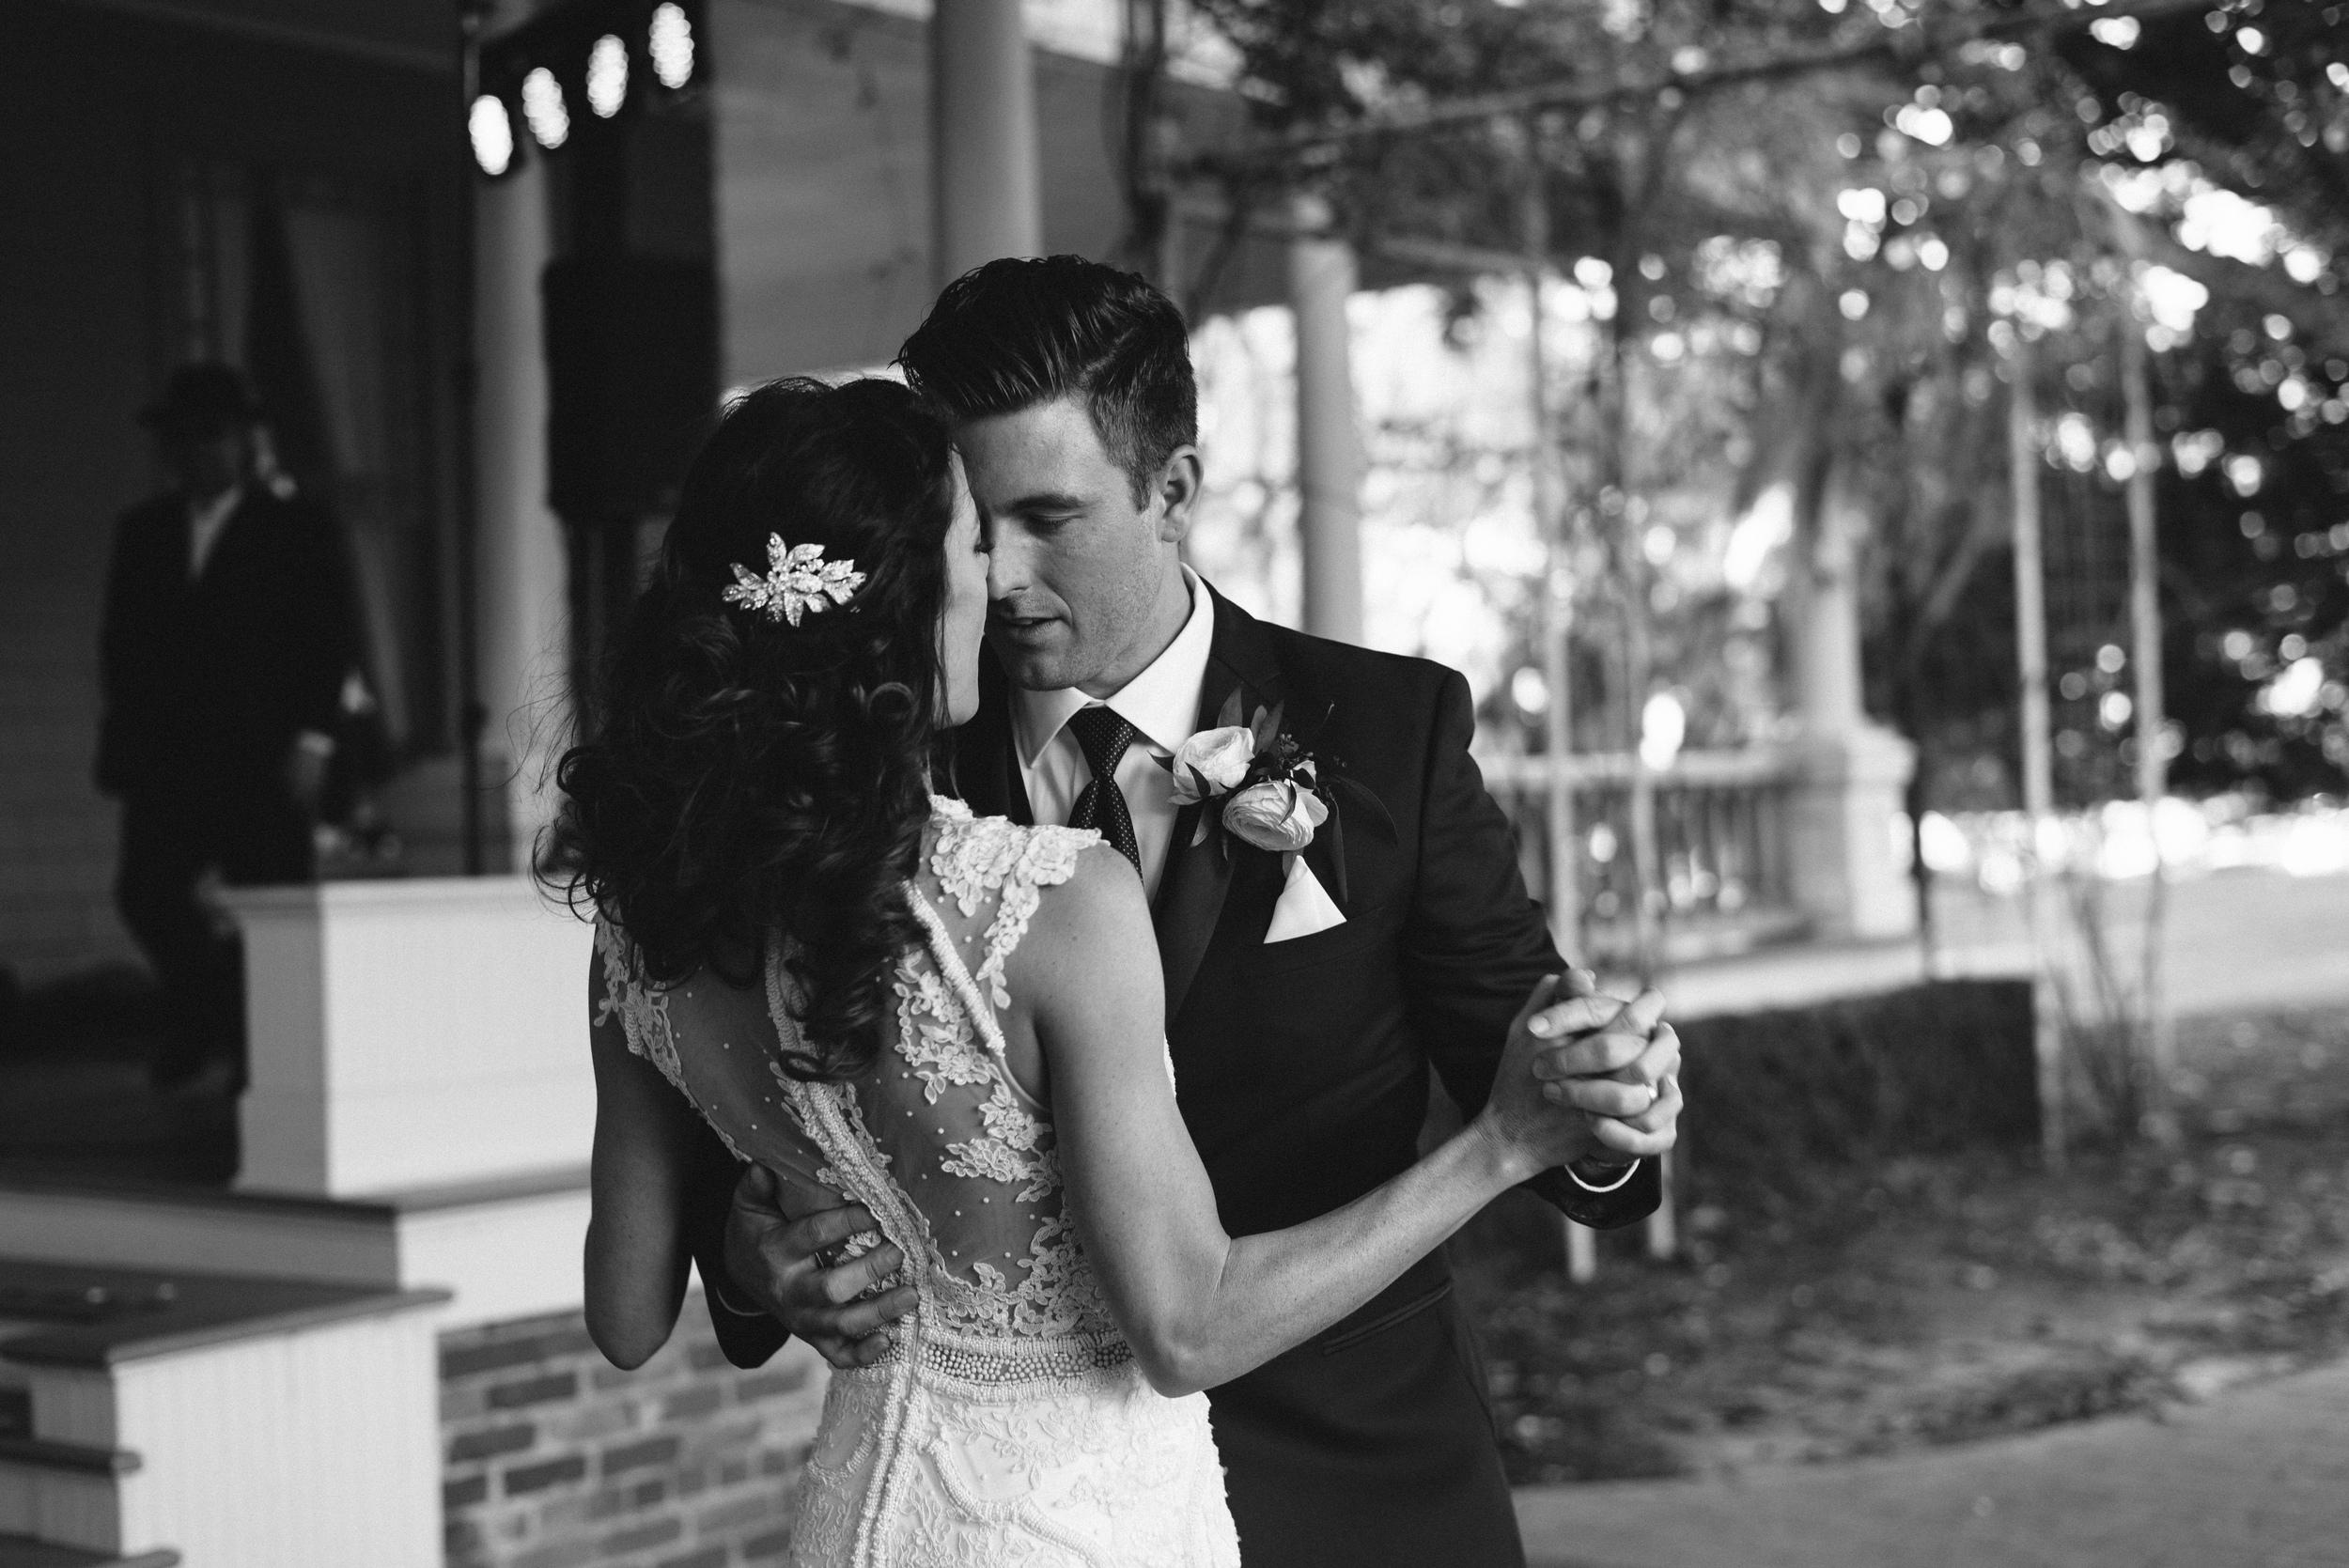 kadi-and-matt-carroll-april-9-2016-jekyl-island-wedding-m-newsom-photography- (328 of 484).jpg